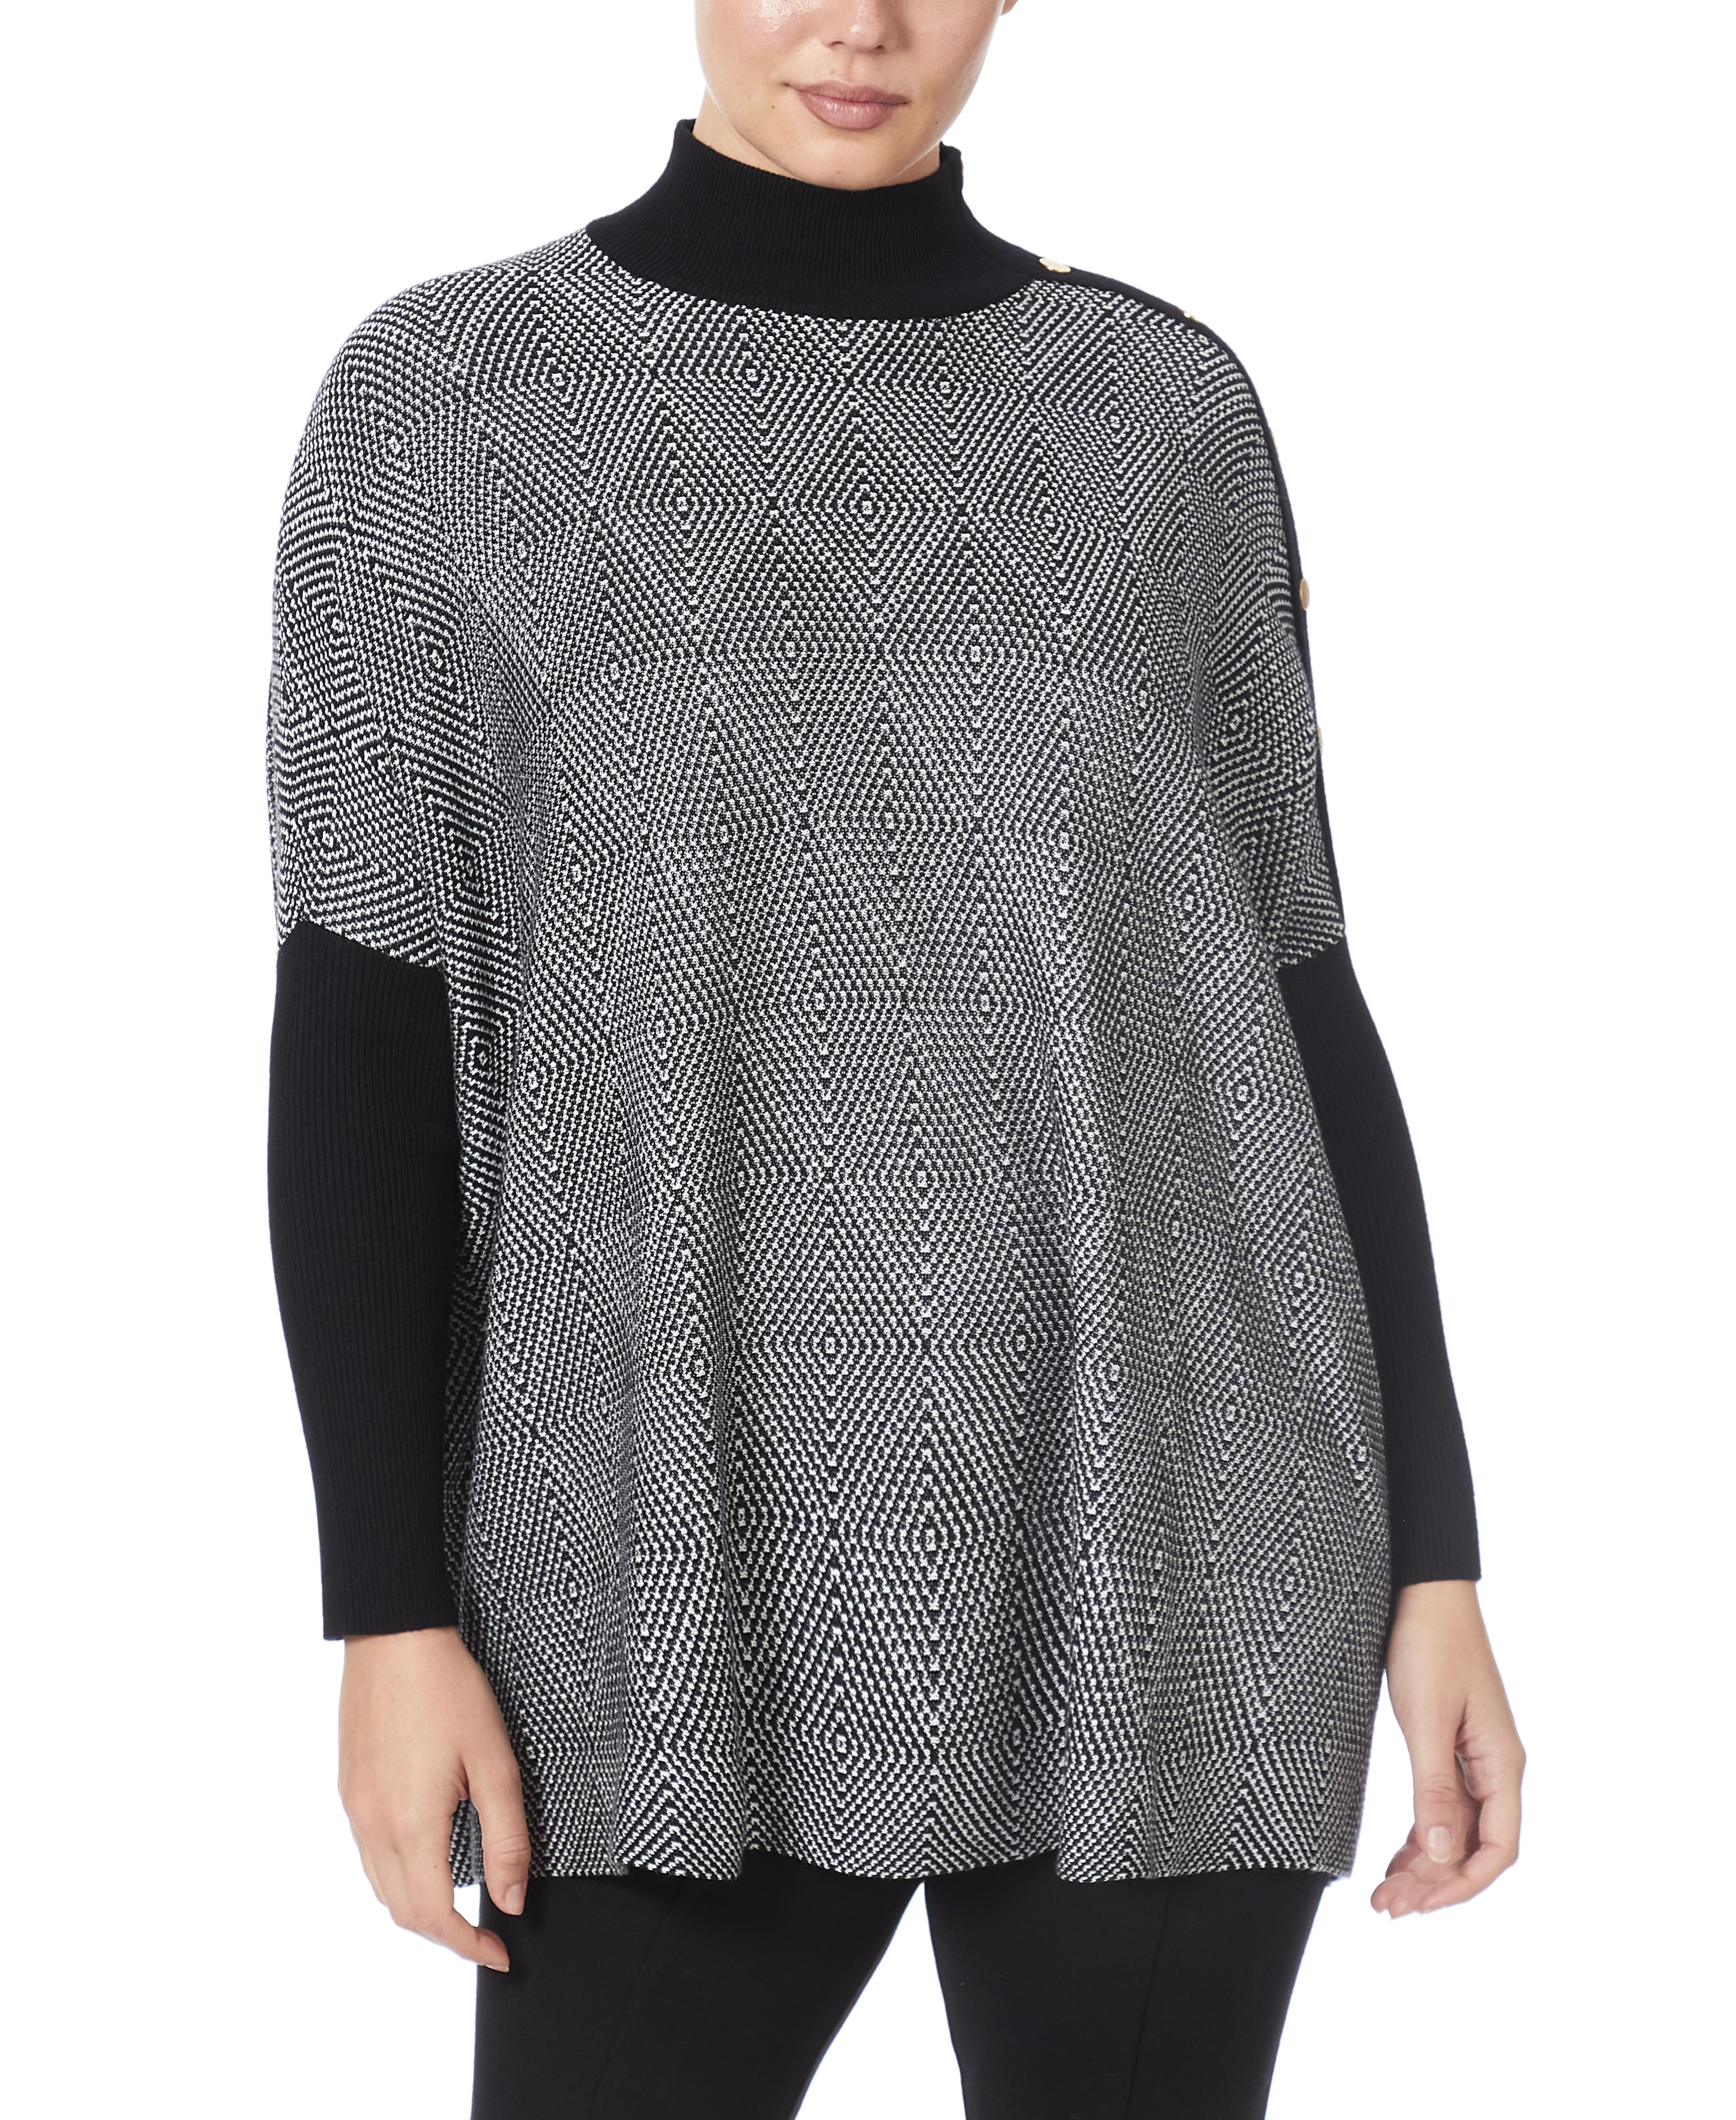 Mock Neck Poncho Sweater in Optic Diamond